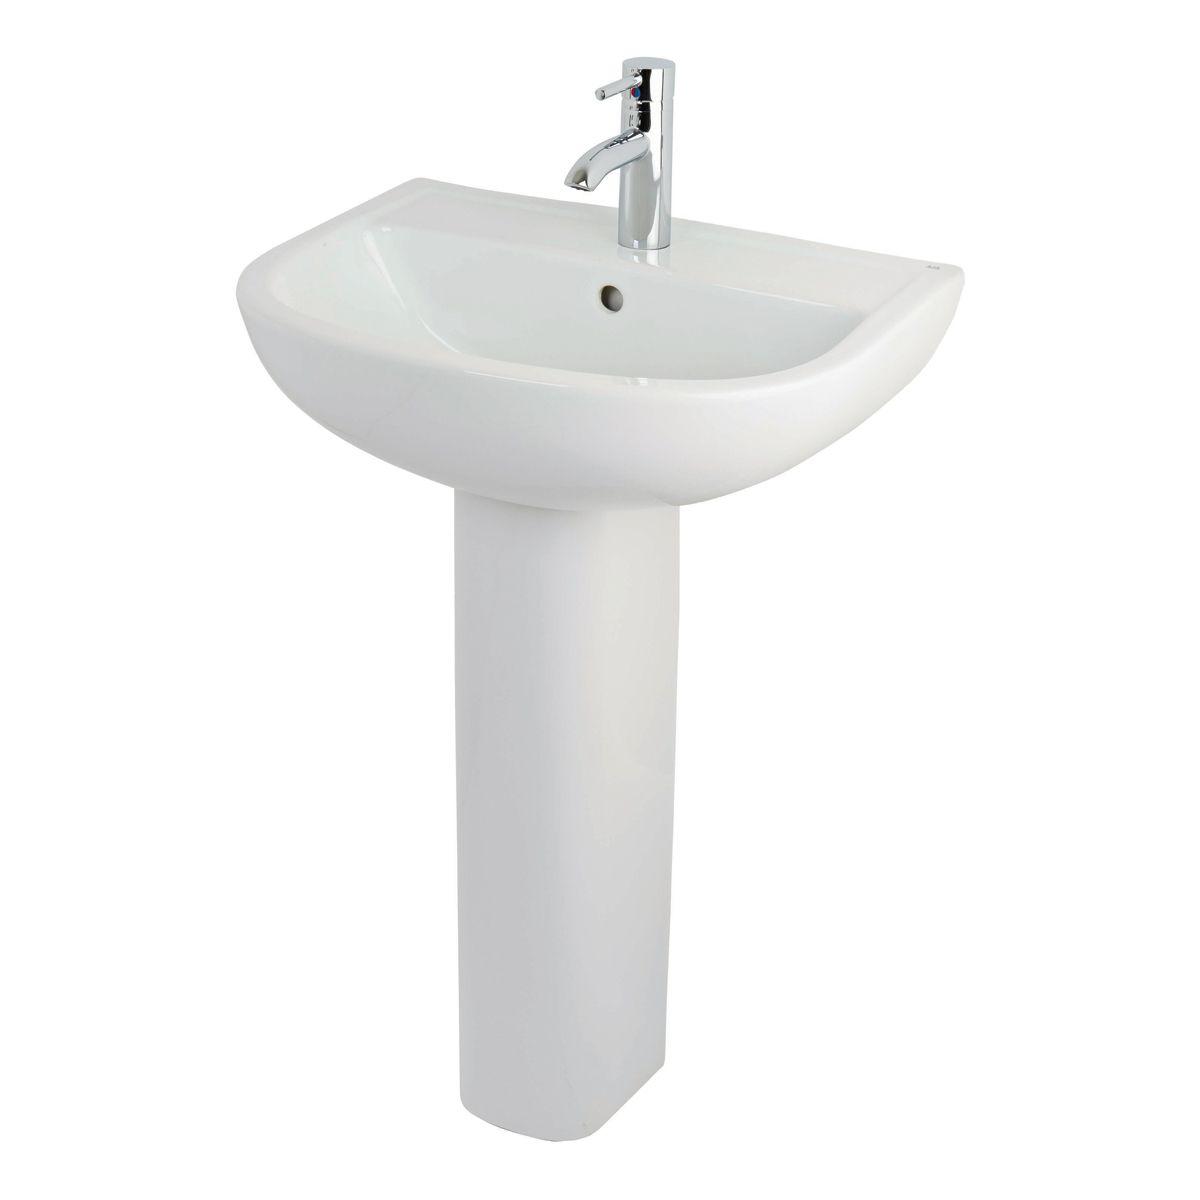 RAK Compact 1 Tap Hole basin with Full Pedestal